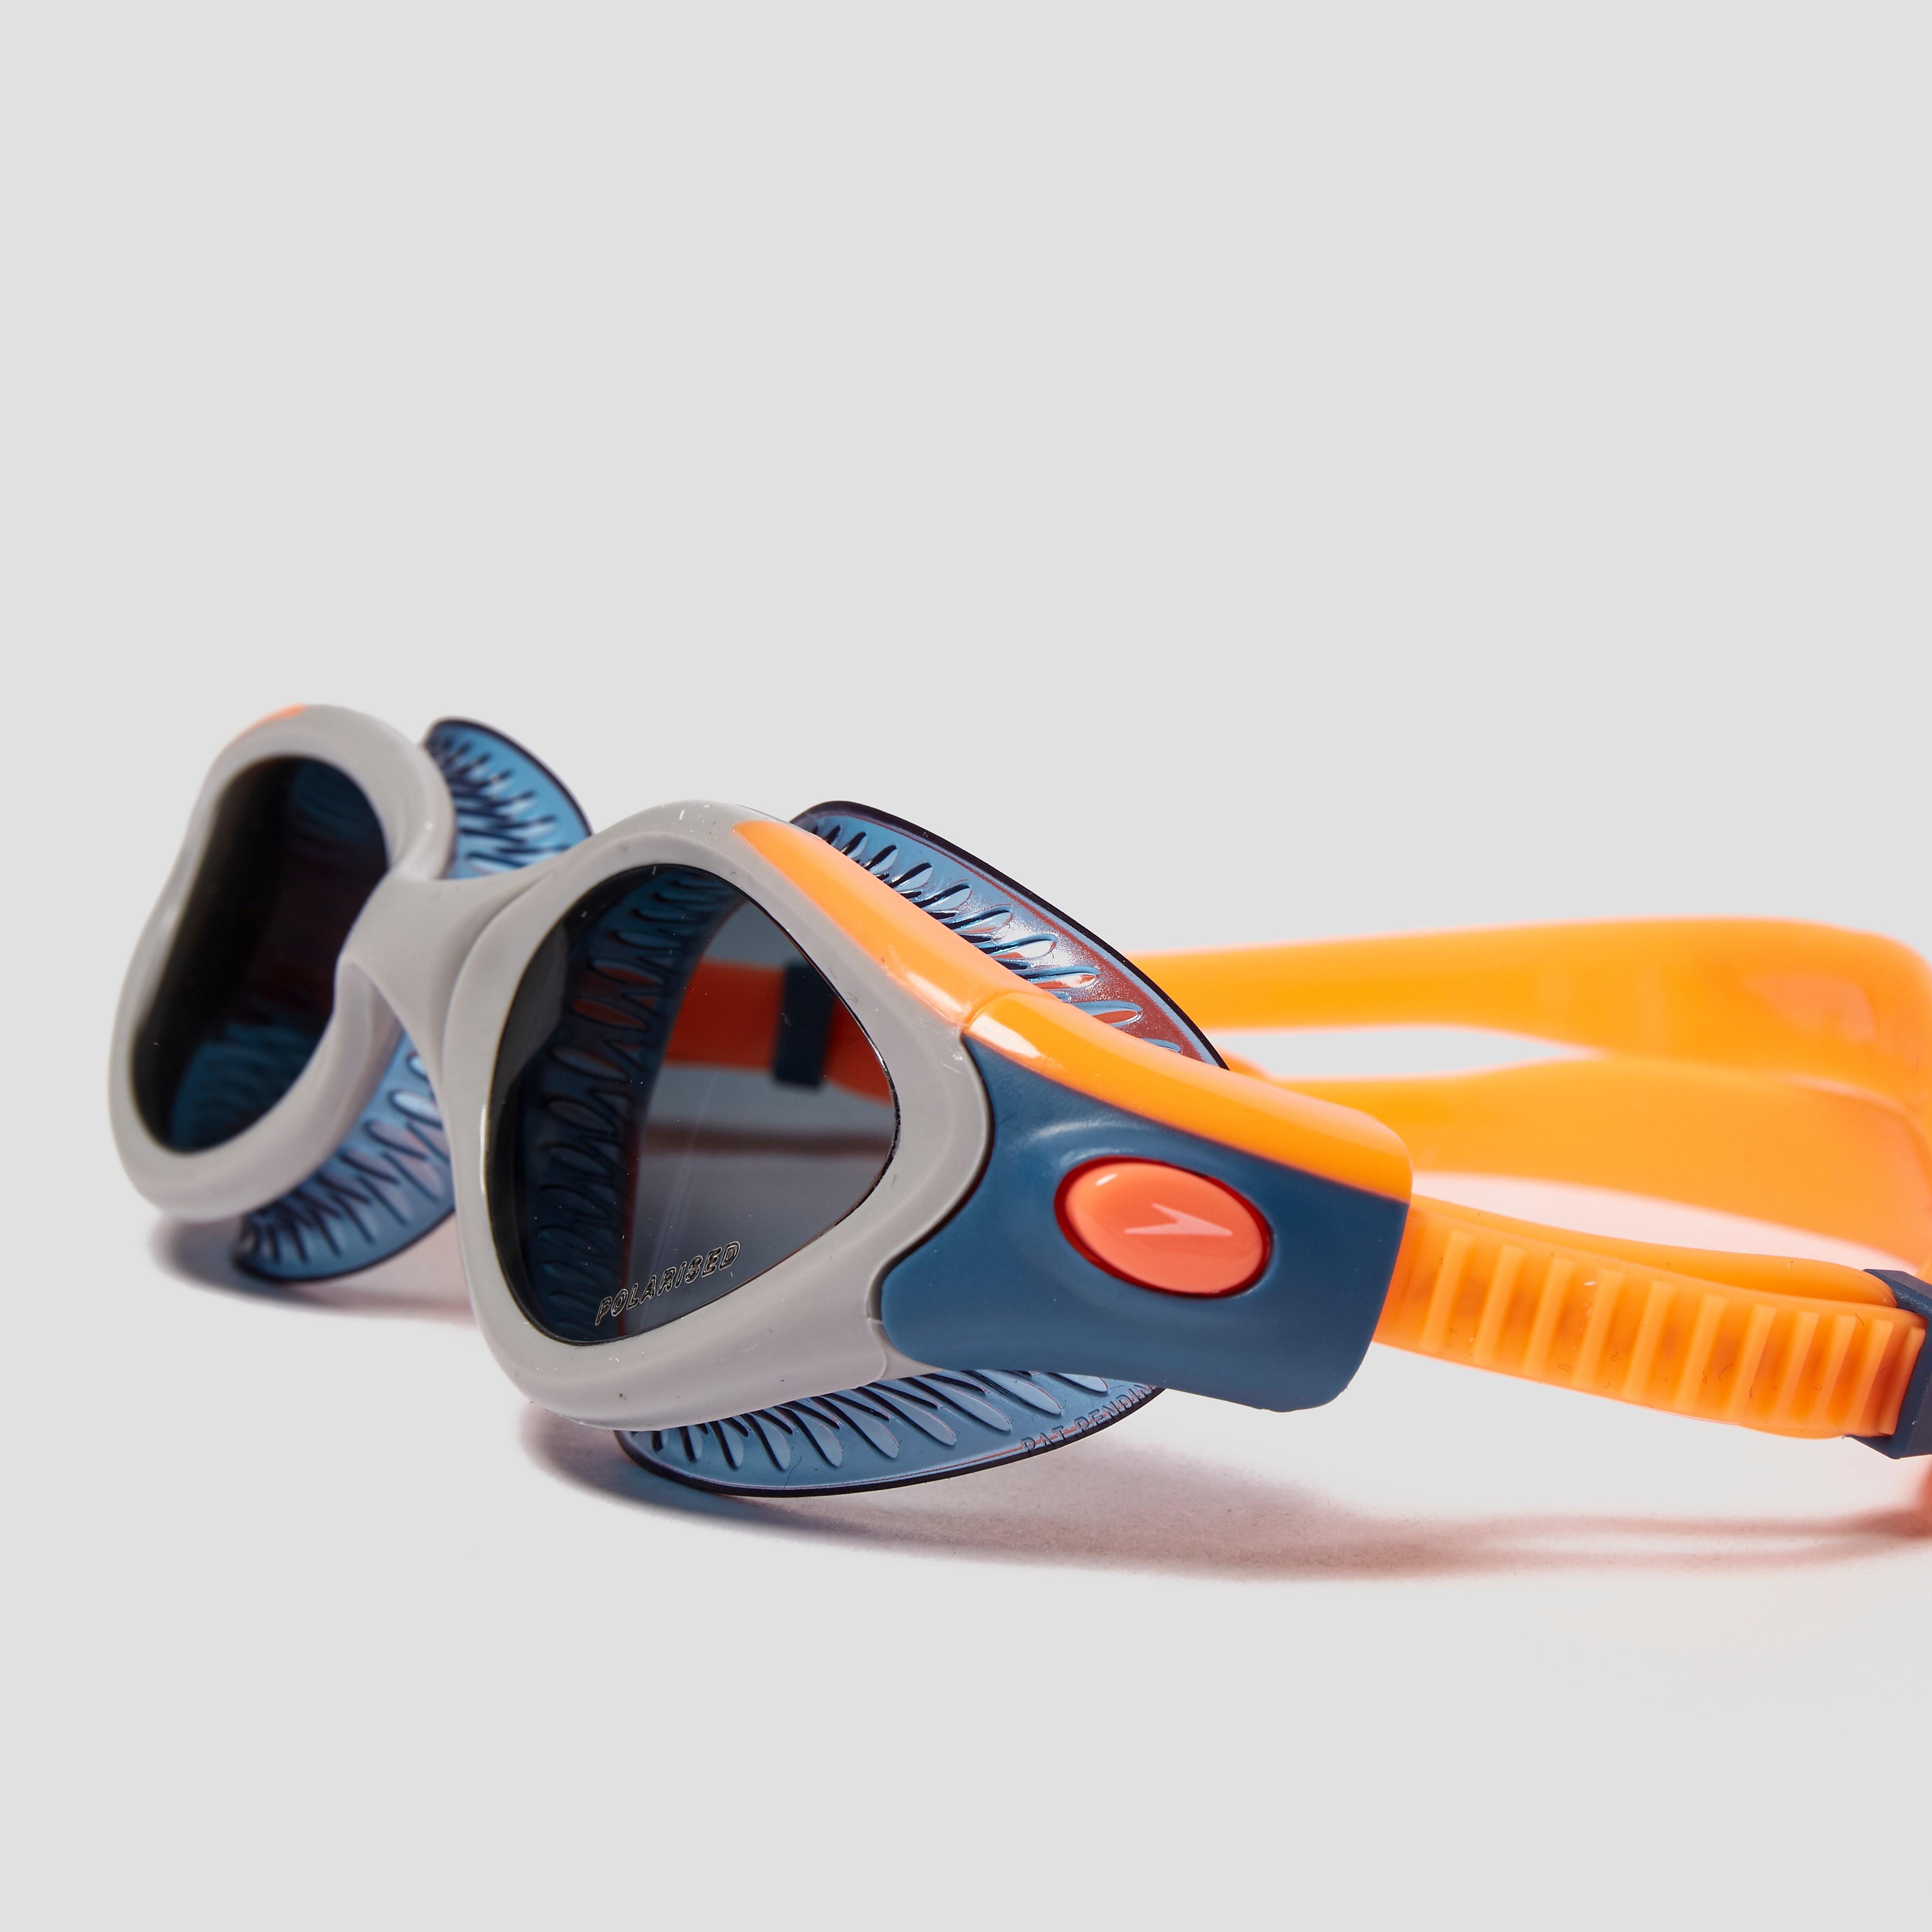 Speedo Futura Biofuse Flexiseal Adult Triathlon Goggle